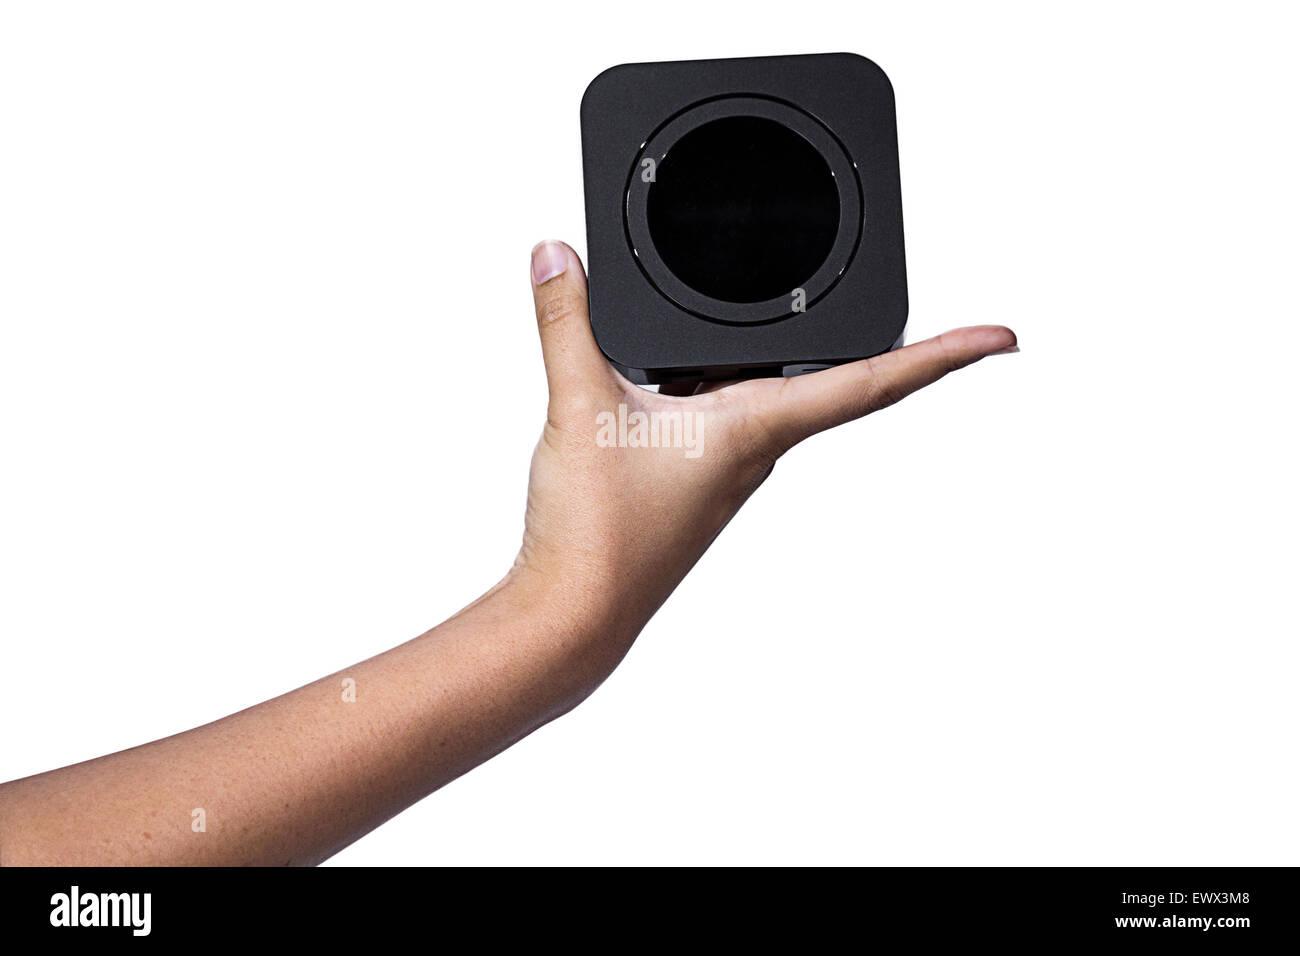 Hand holding square black box and black circle inside box - Stock Image